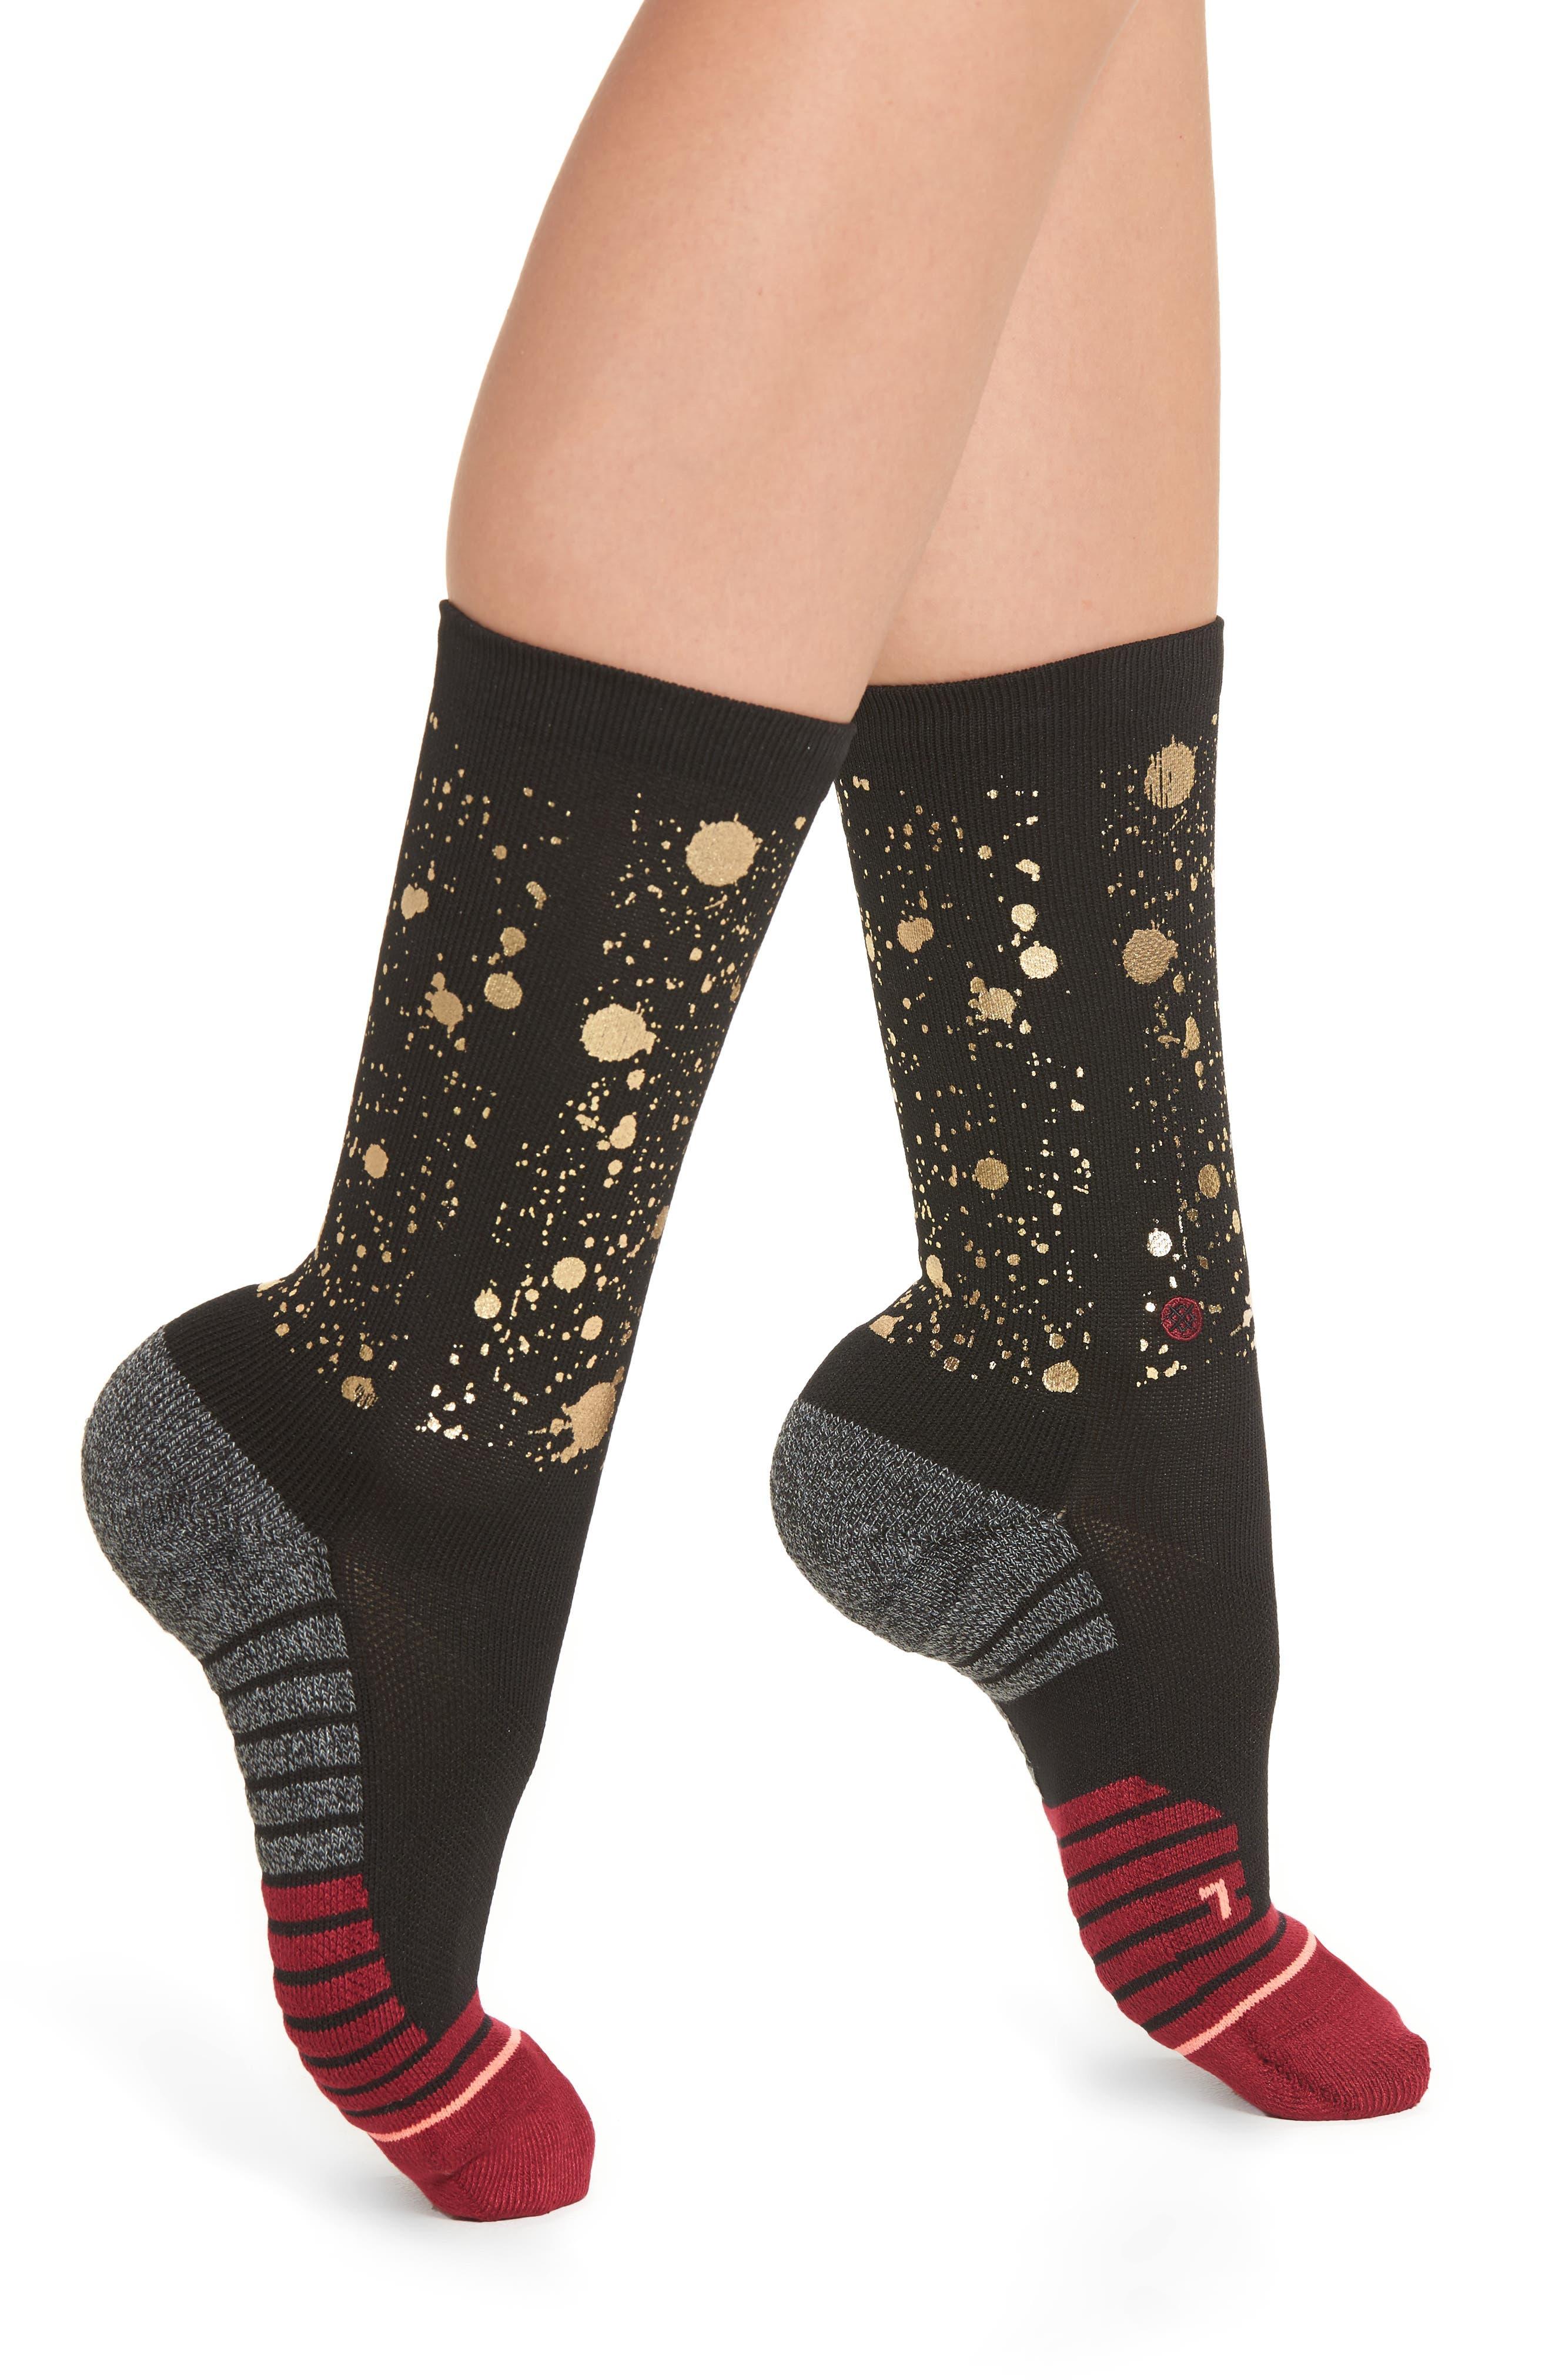 Endorphin Training Socks,                             Main thumbnail 1, color,